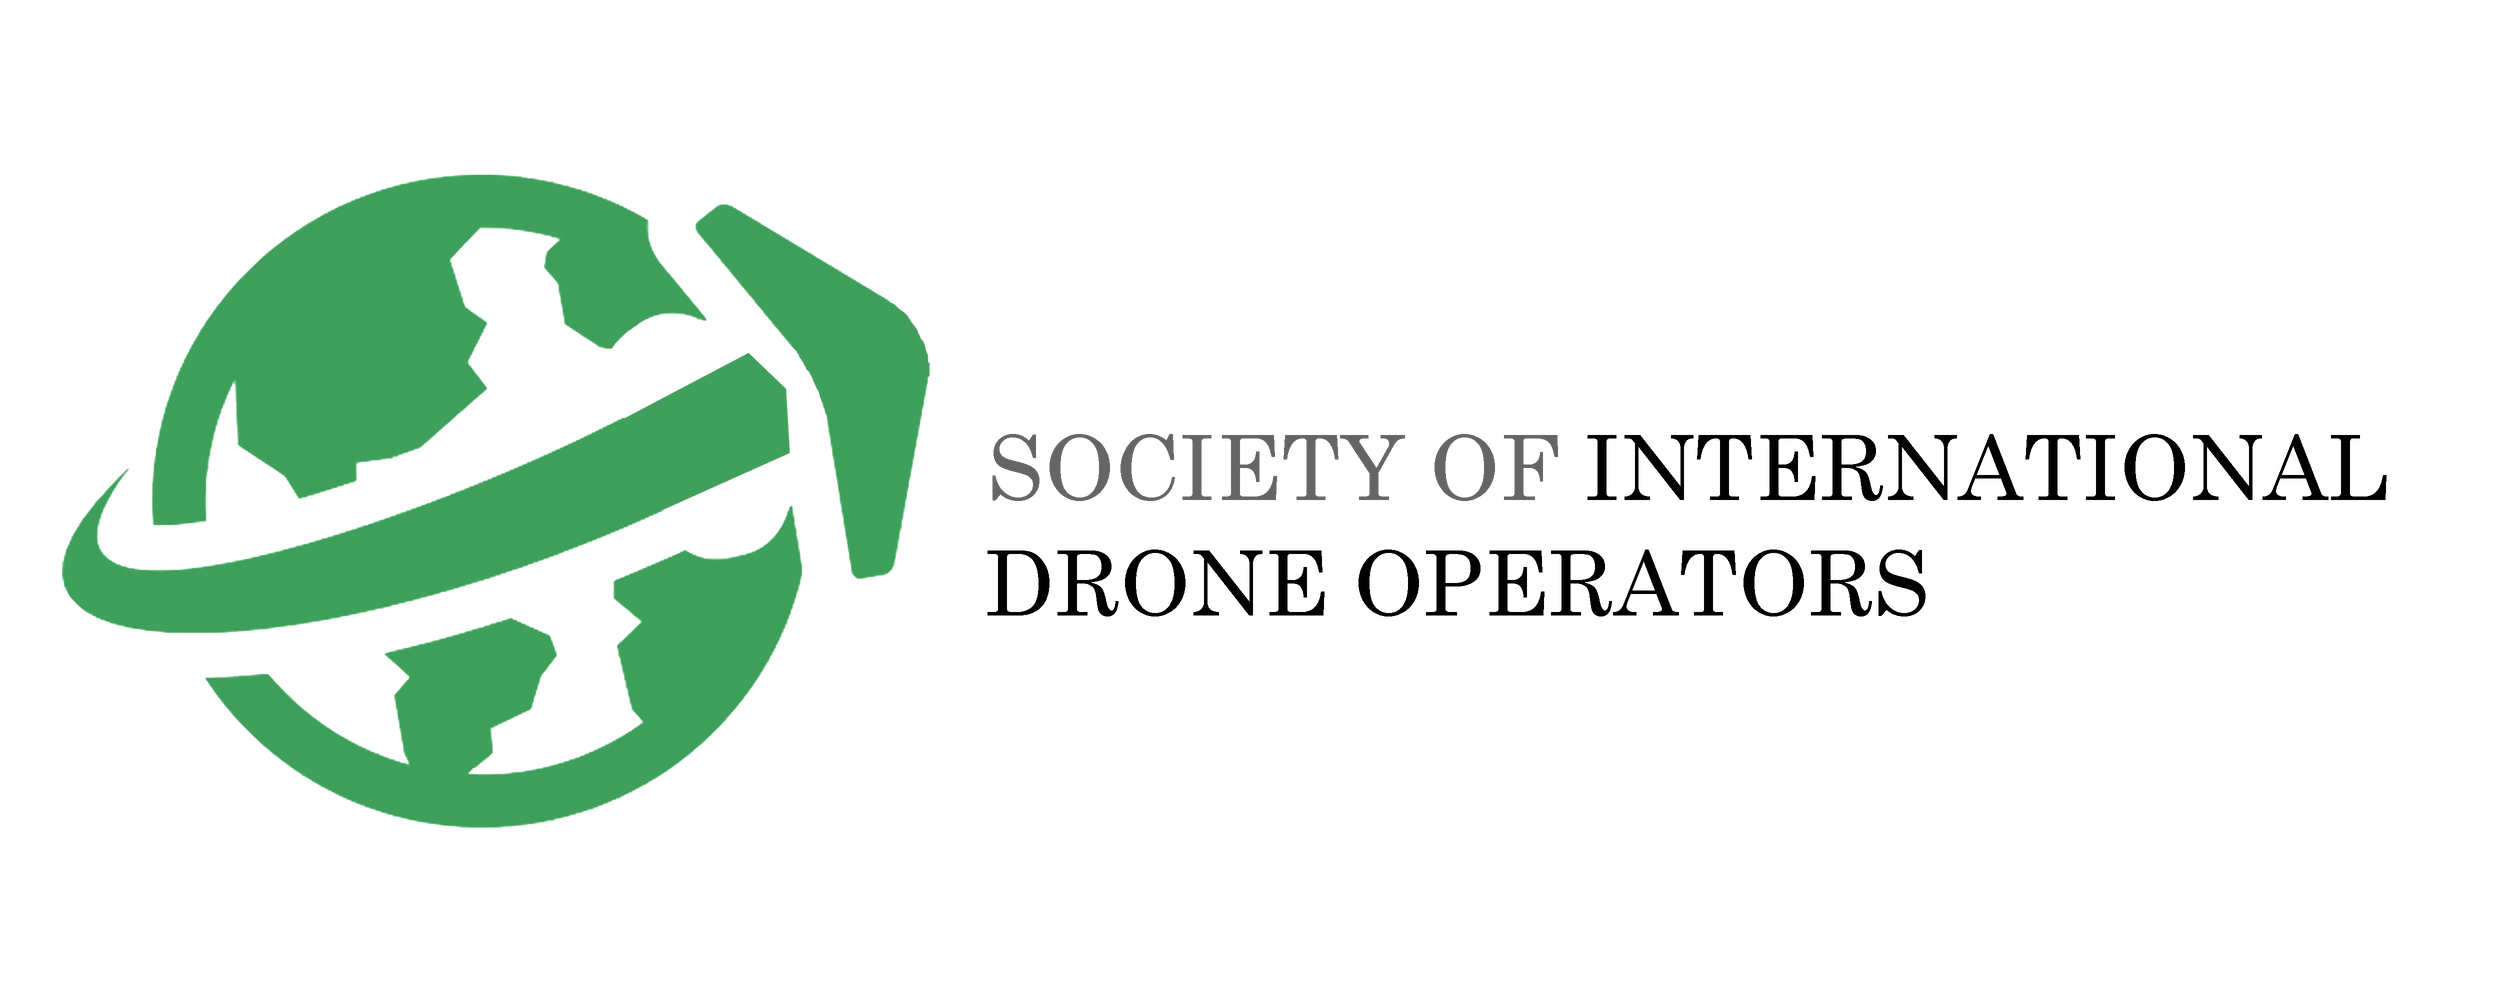 Society of International Drone Operators